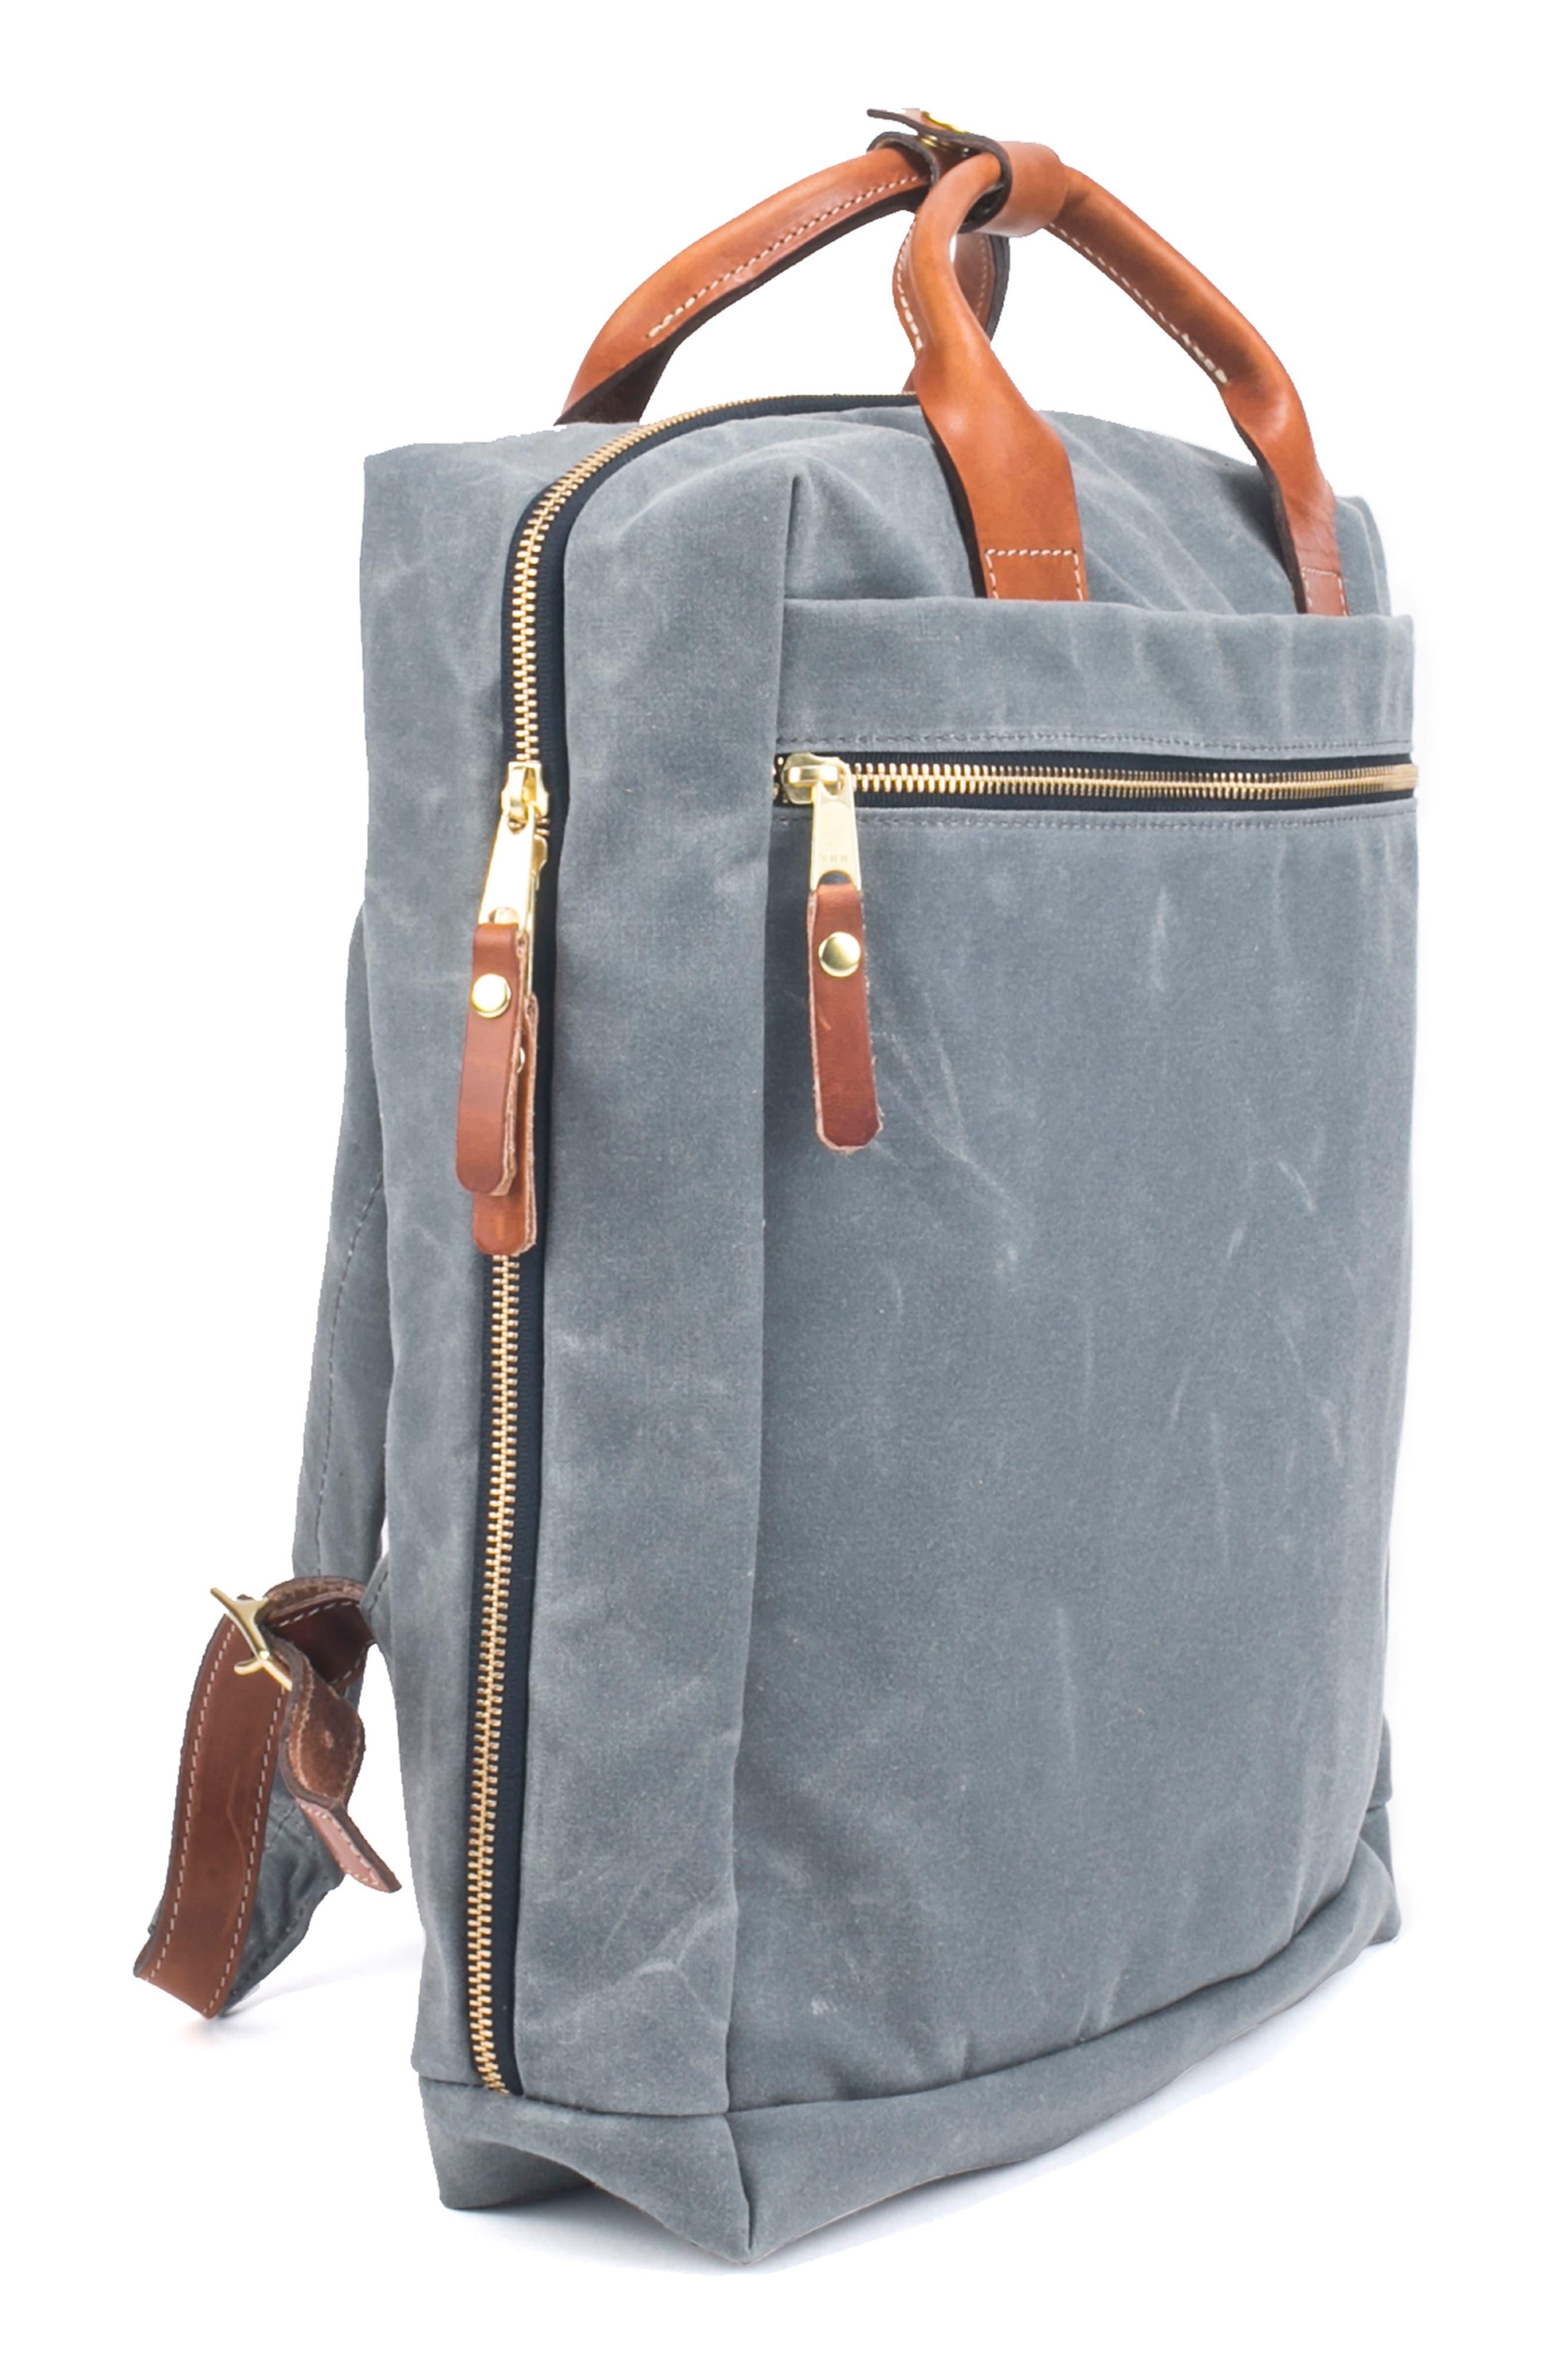 Metro Backpack,                             Alternate thumbnail 3, color,                             Charcoal